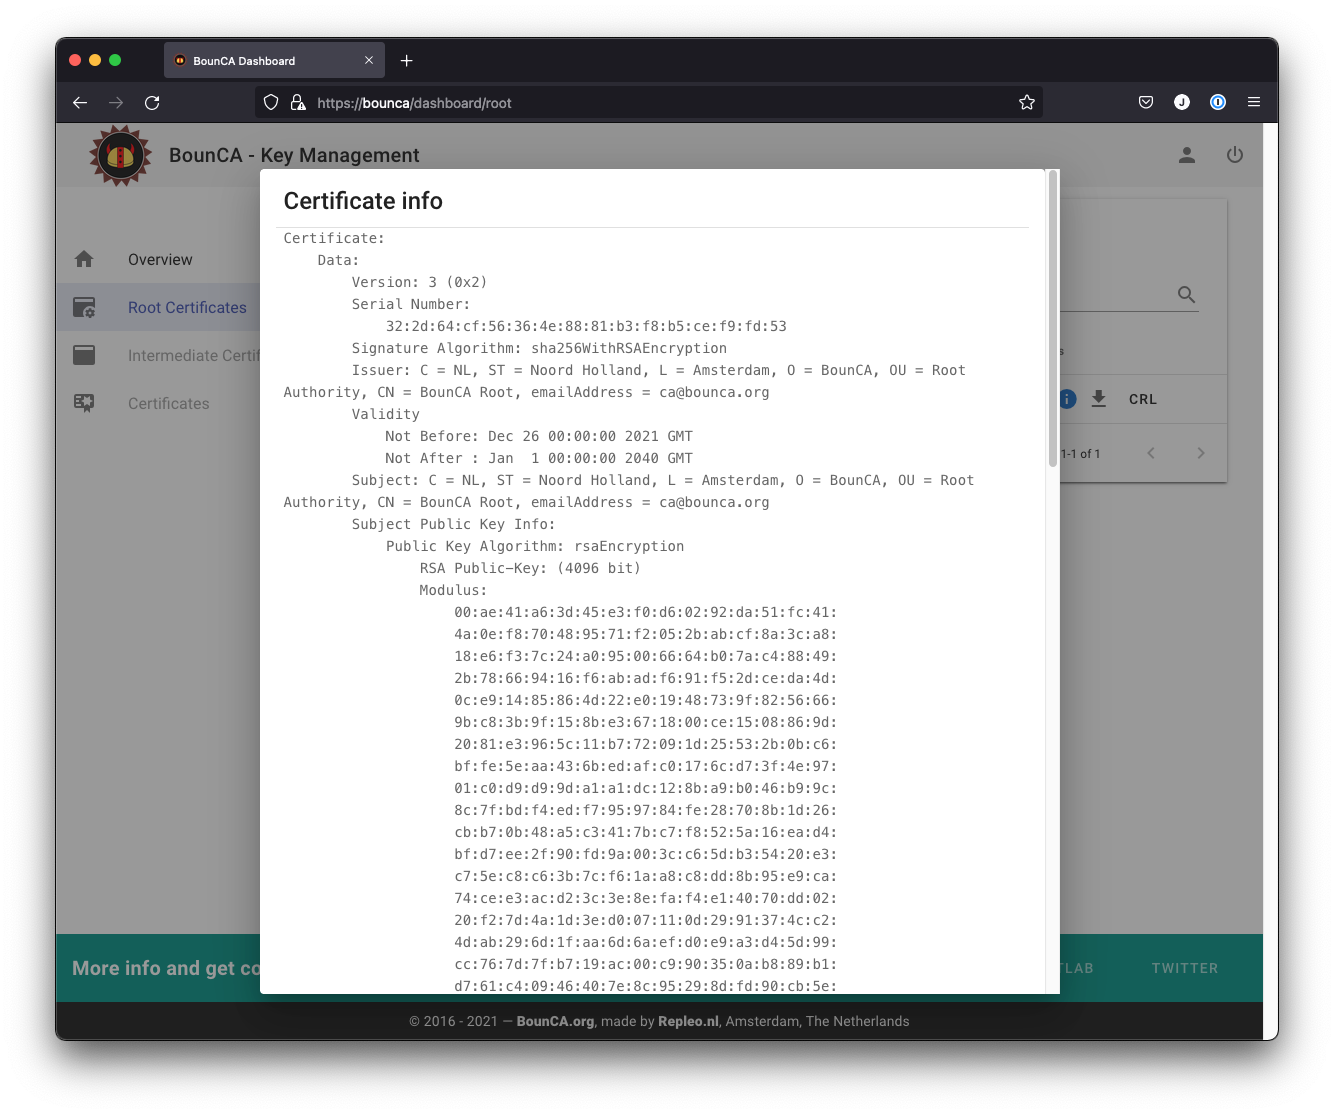 Site structure — BounCA org generate self-signed SSL